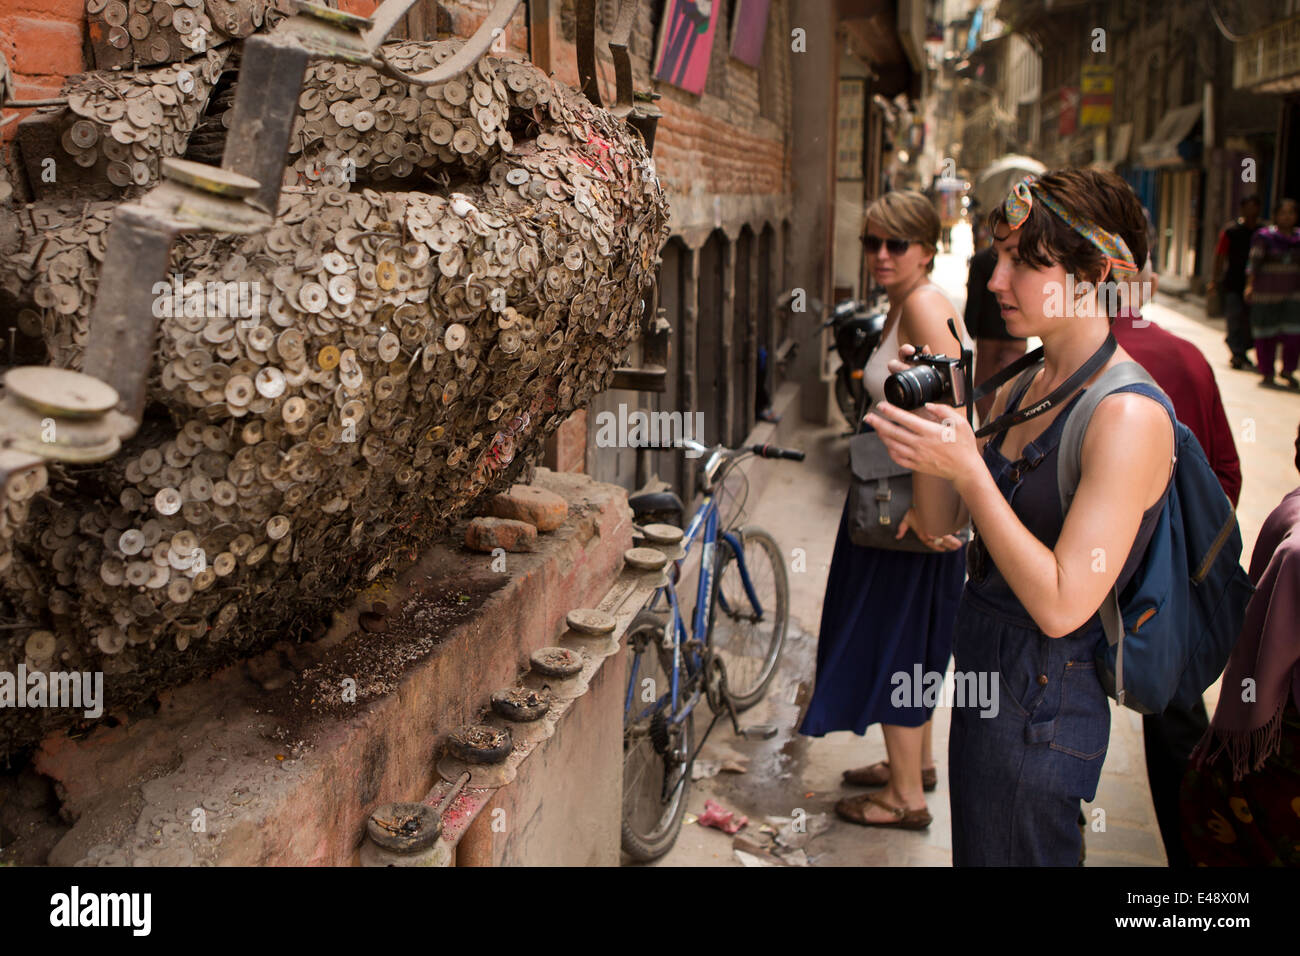 Nepal, Kathmandu, Bangemudha Square, Vaisha Dev Toothache God tree, coins nailed to cure tooth ache - Stock Image